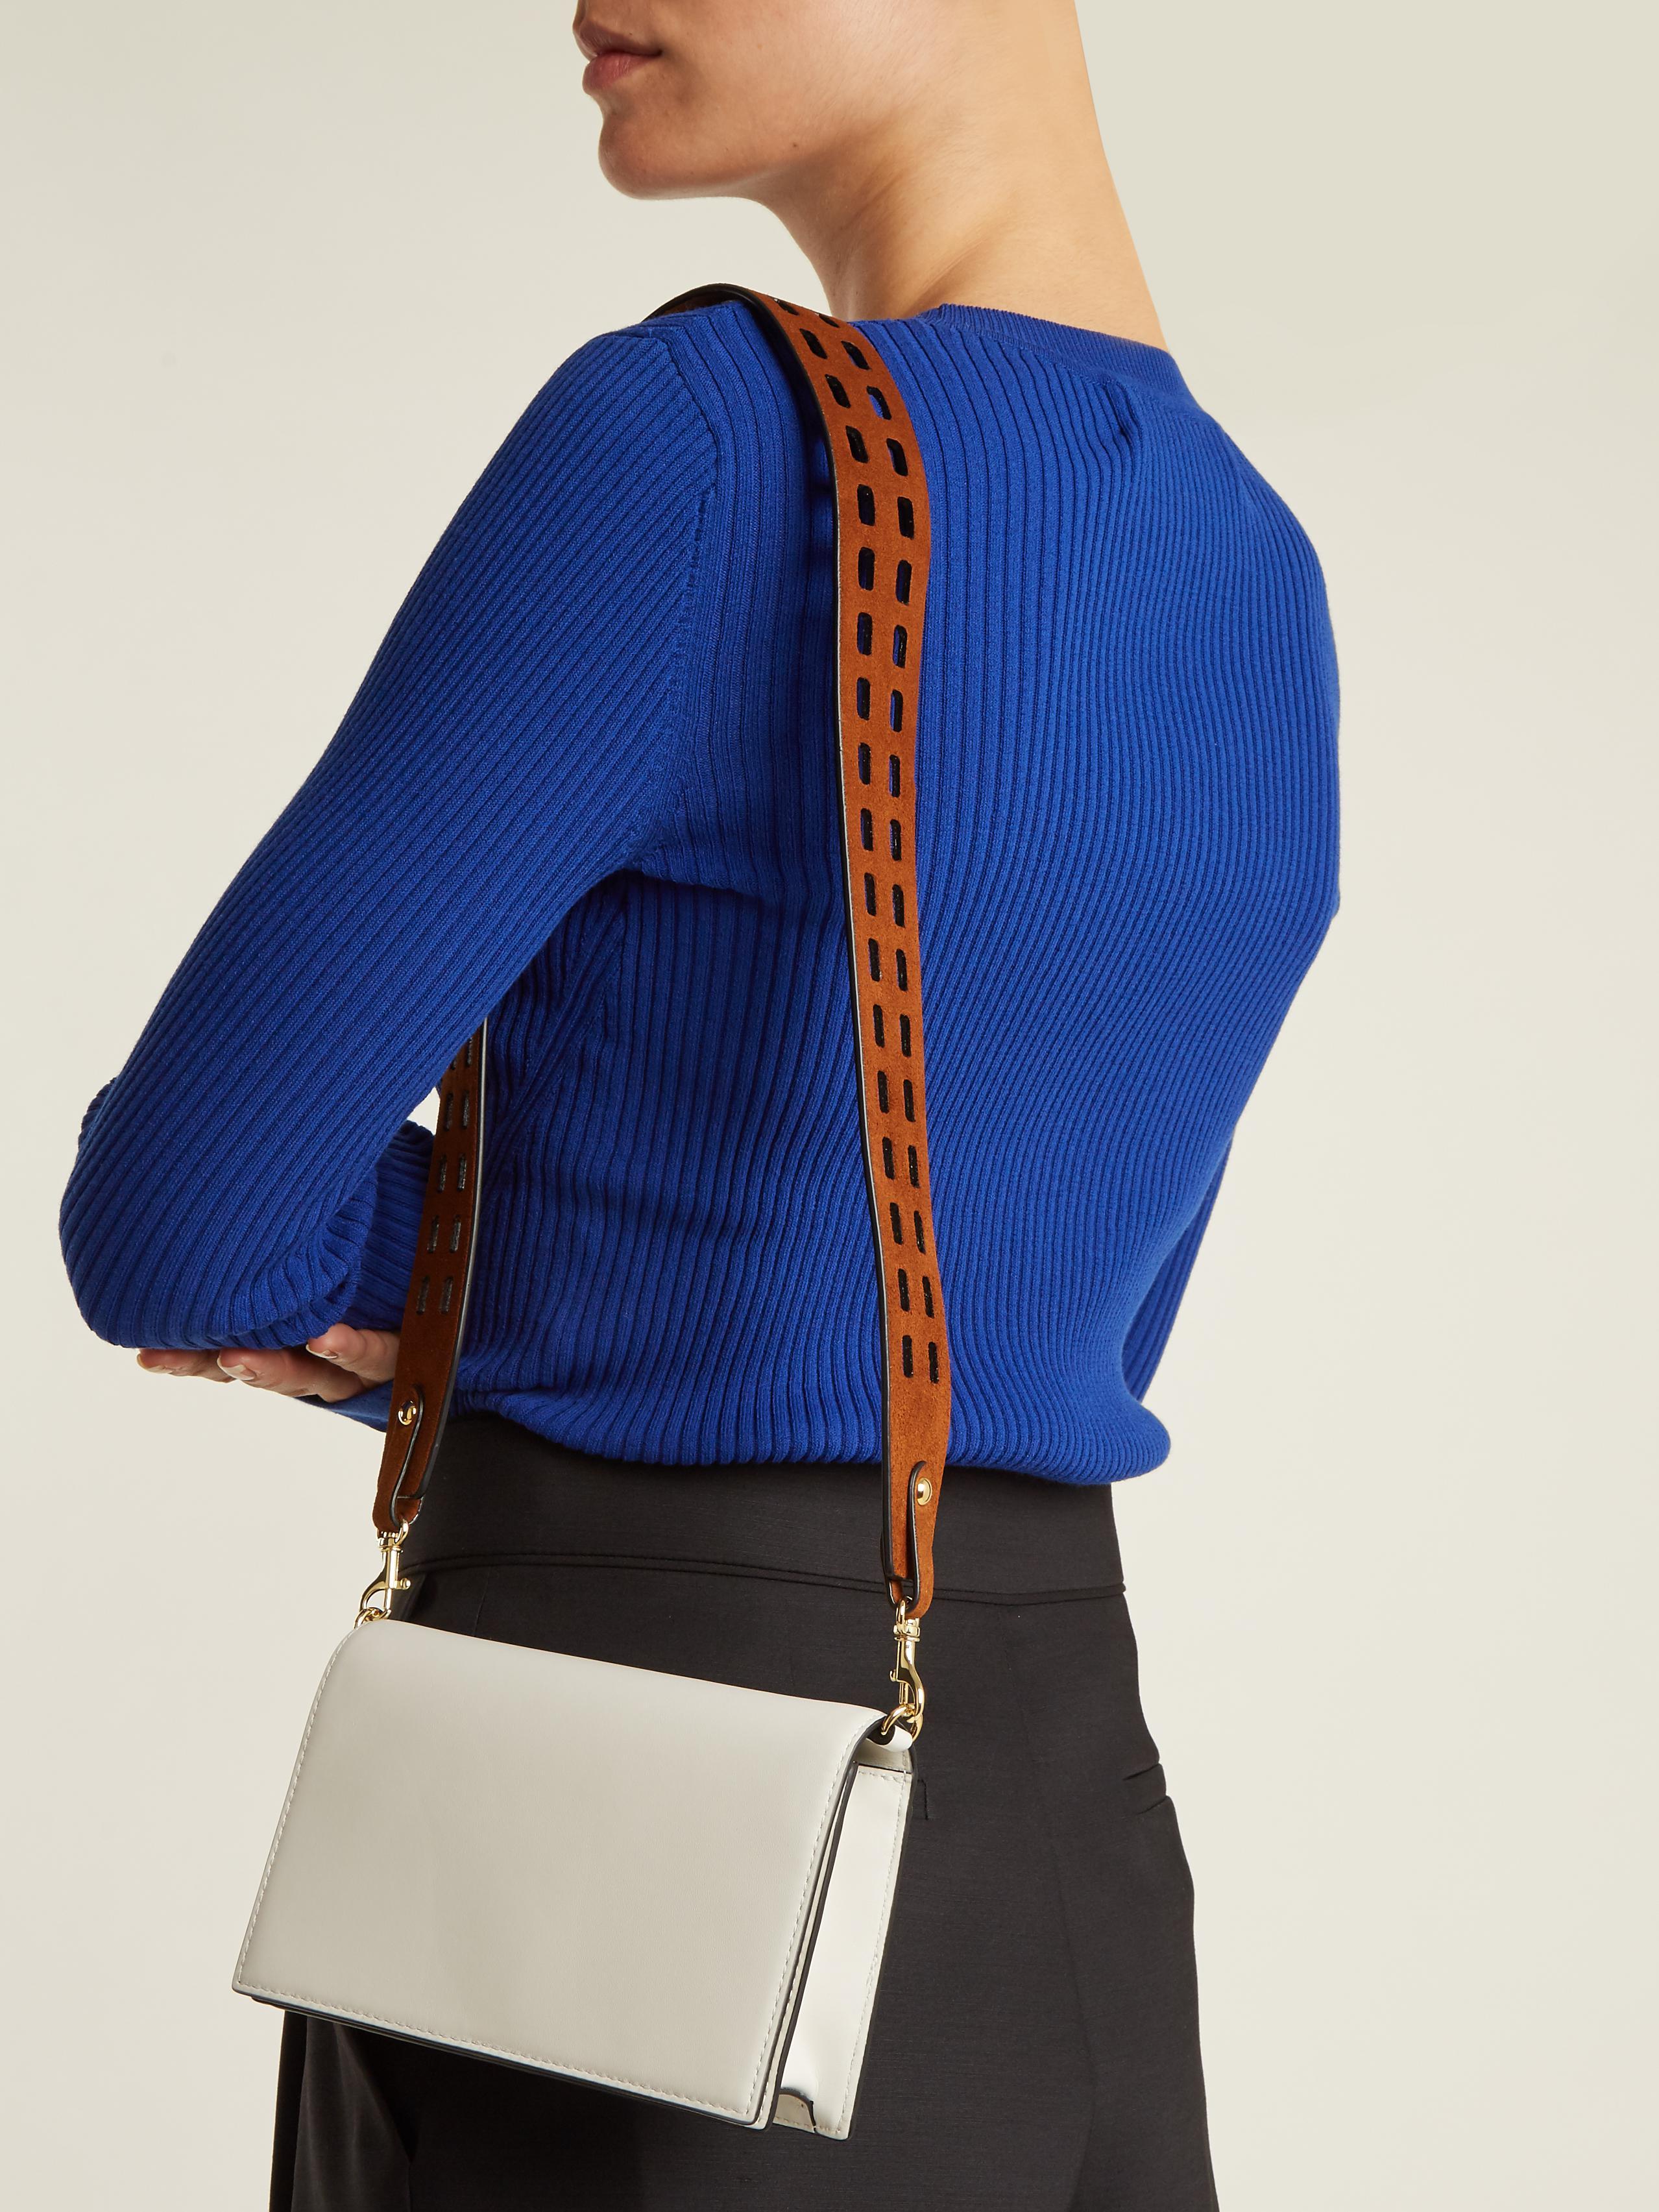 b93ae94d7c60 Lyst - Diane von Furstenberg Soirée Double-strap Leather Cross-body ...